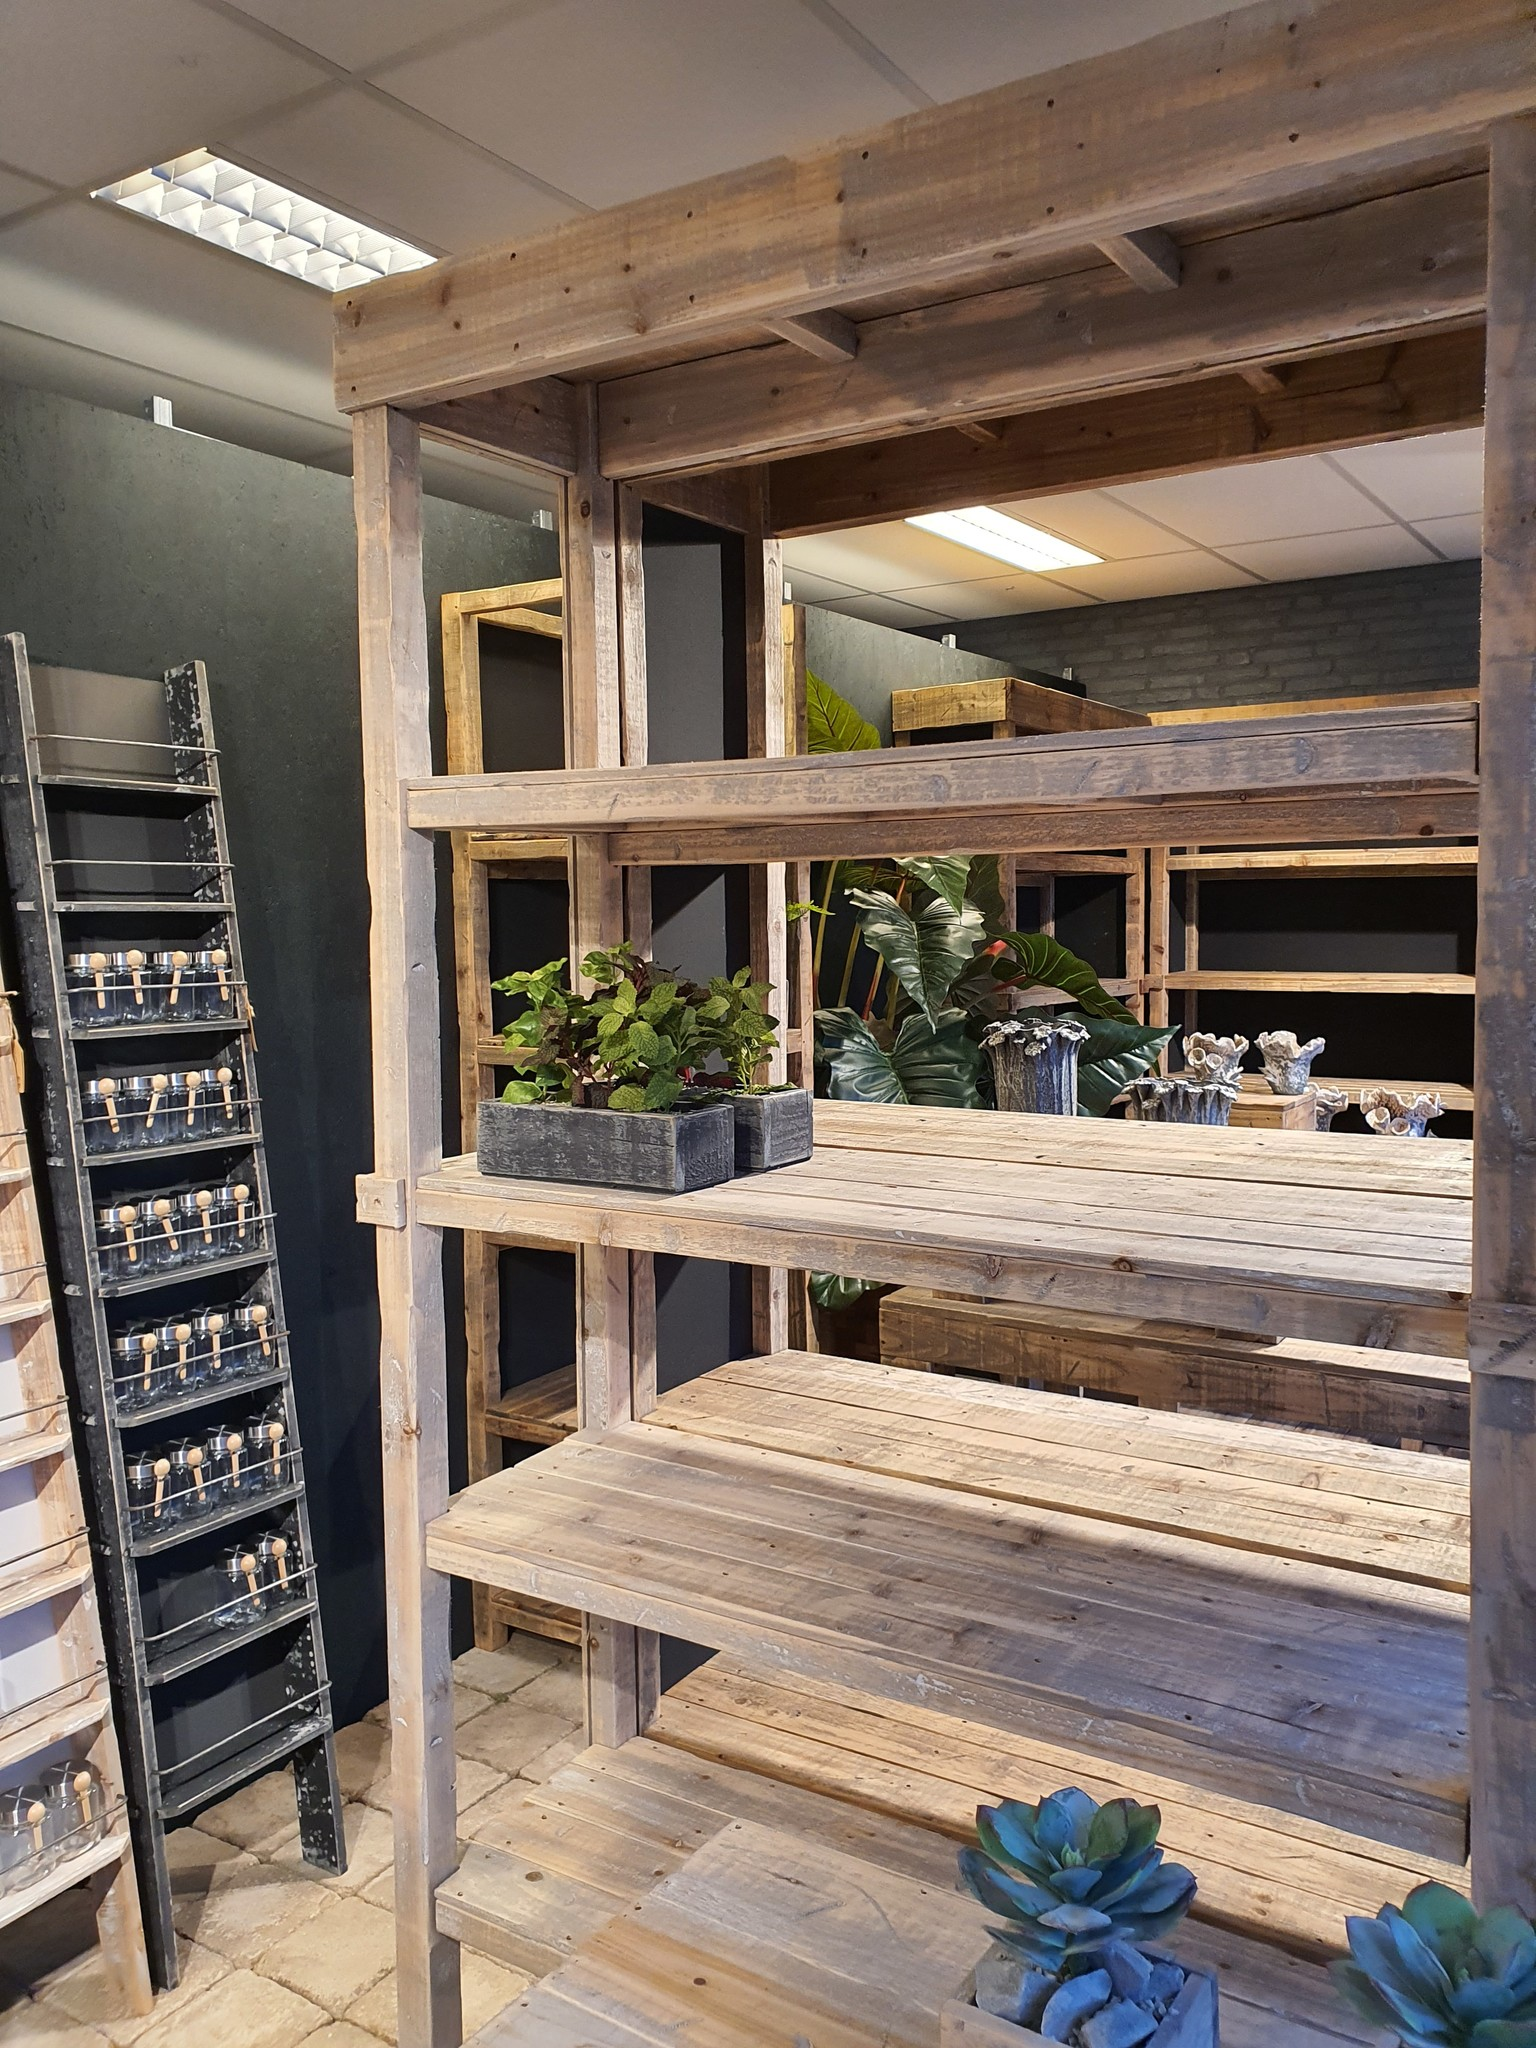 shop int old dutch cabinet C 220-2